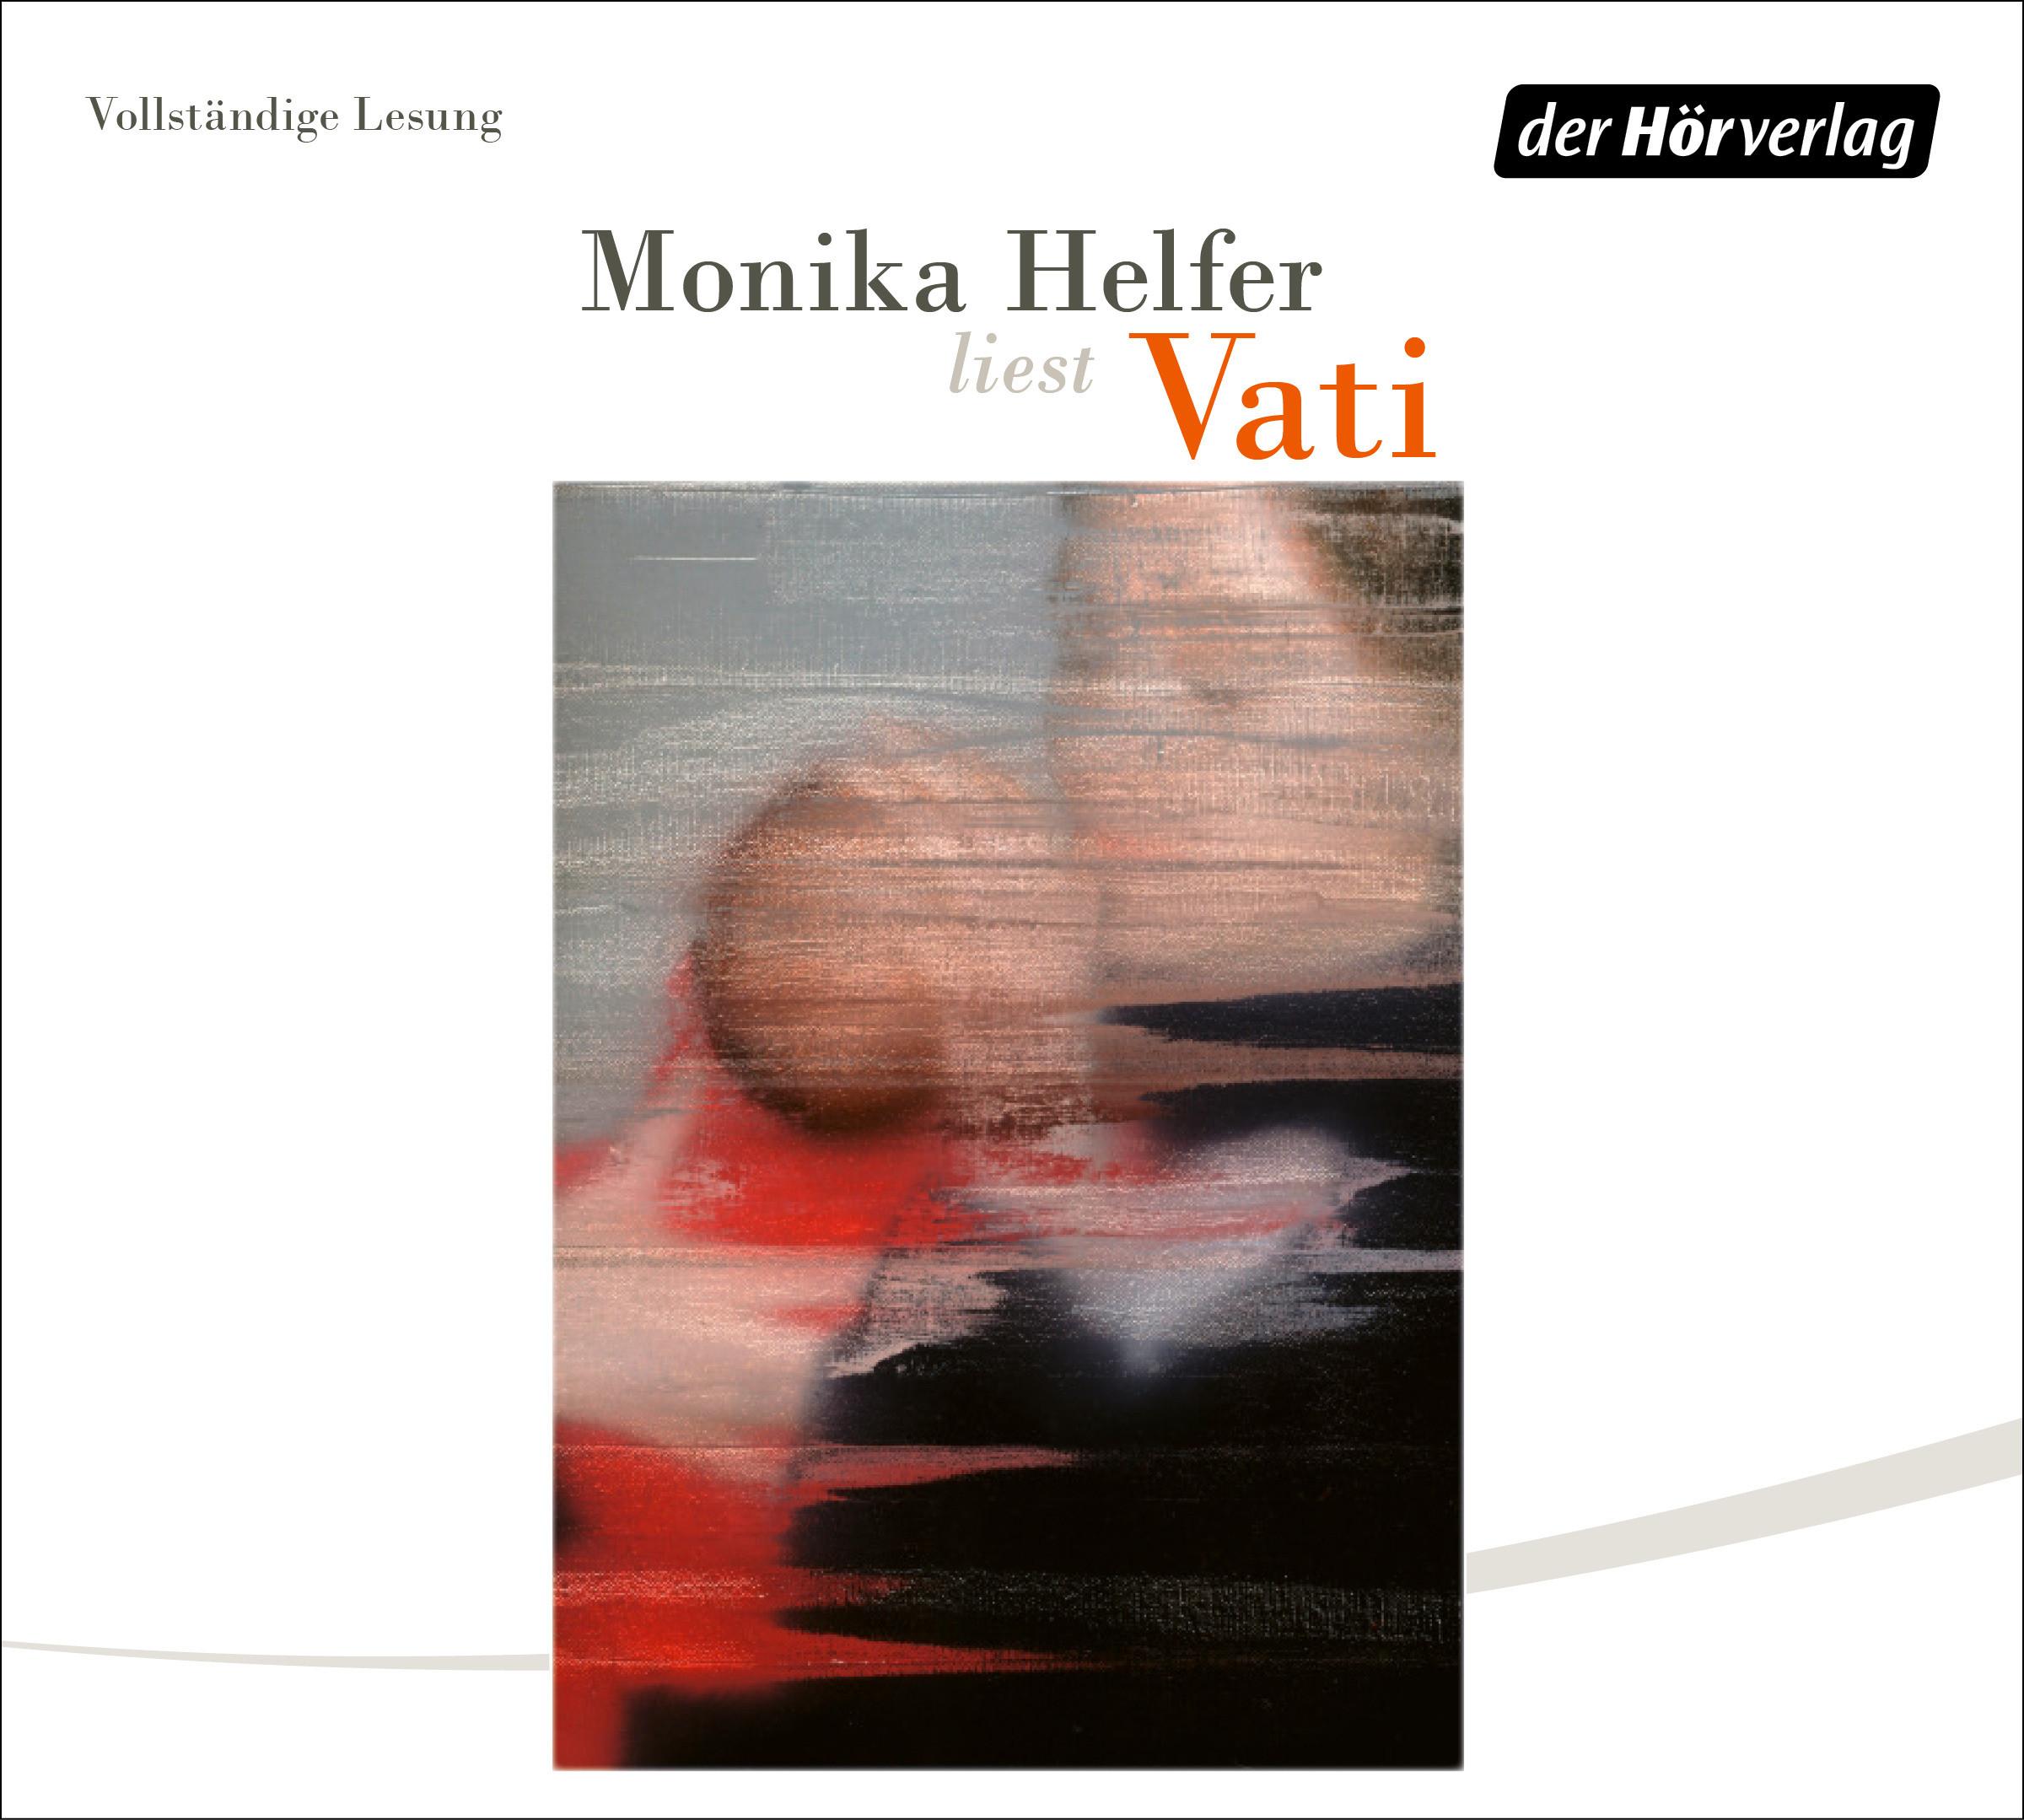 Monika Helfer - Vati